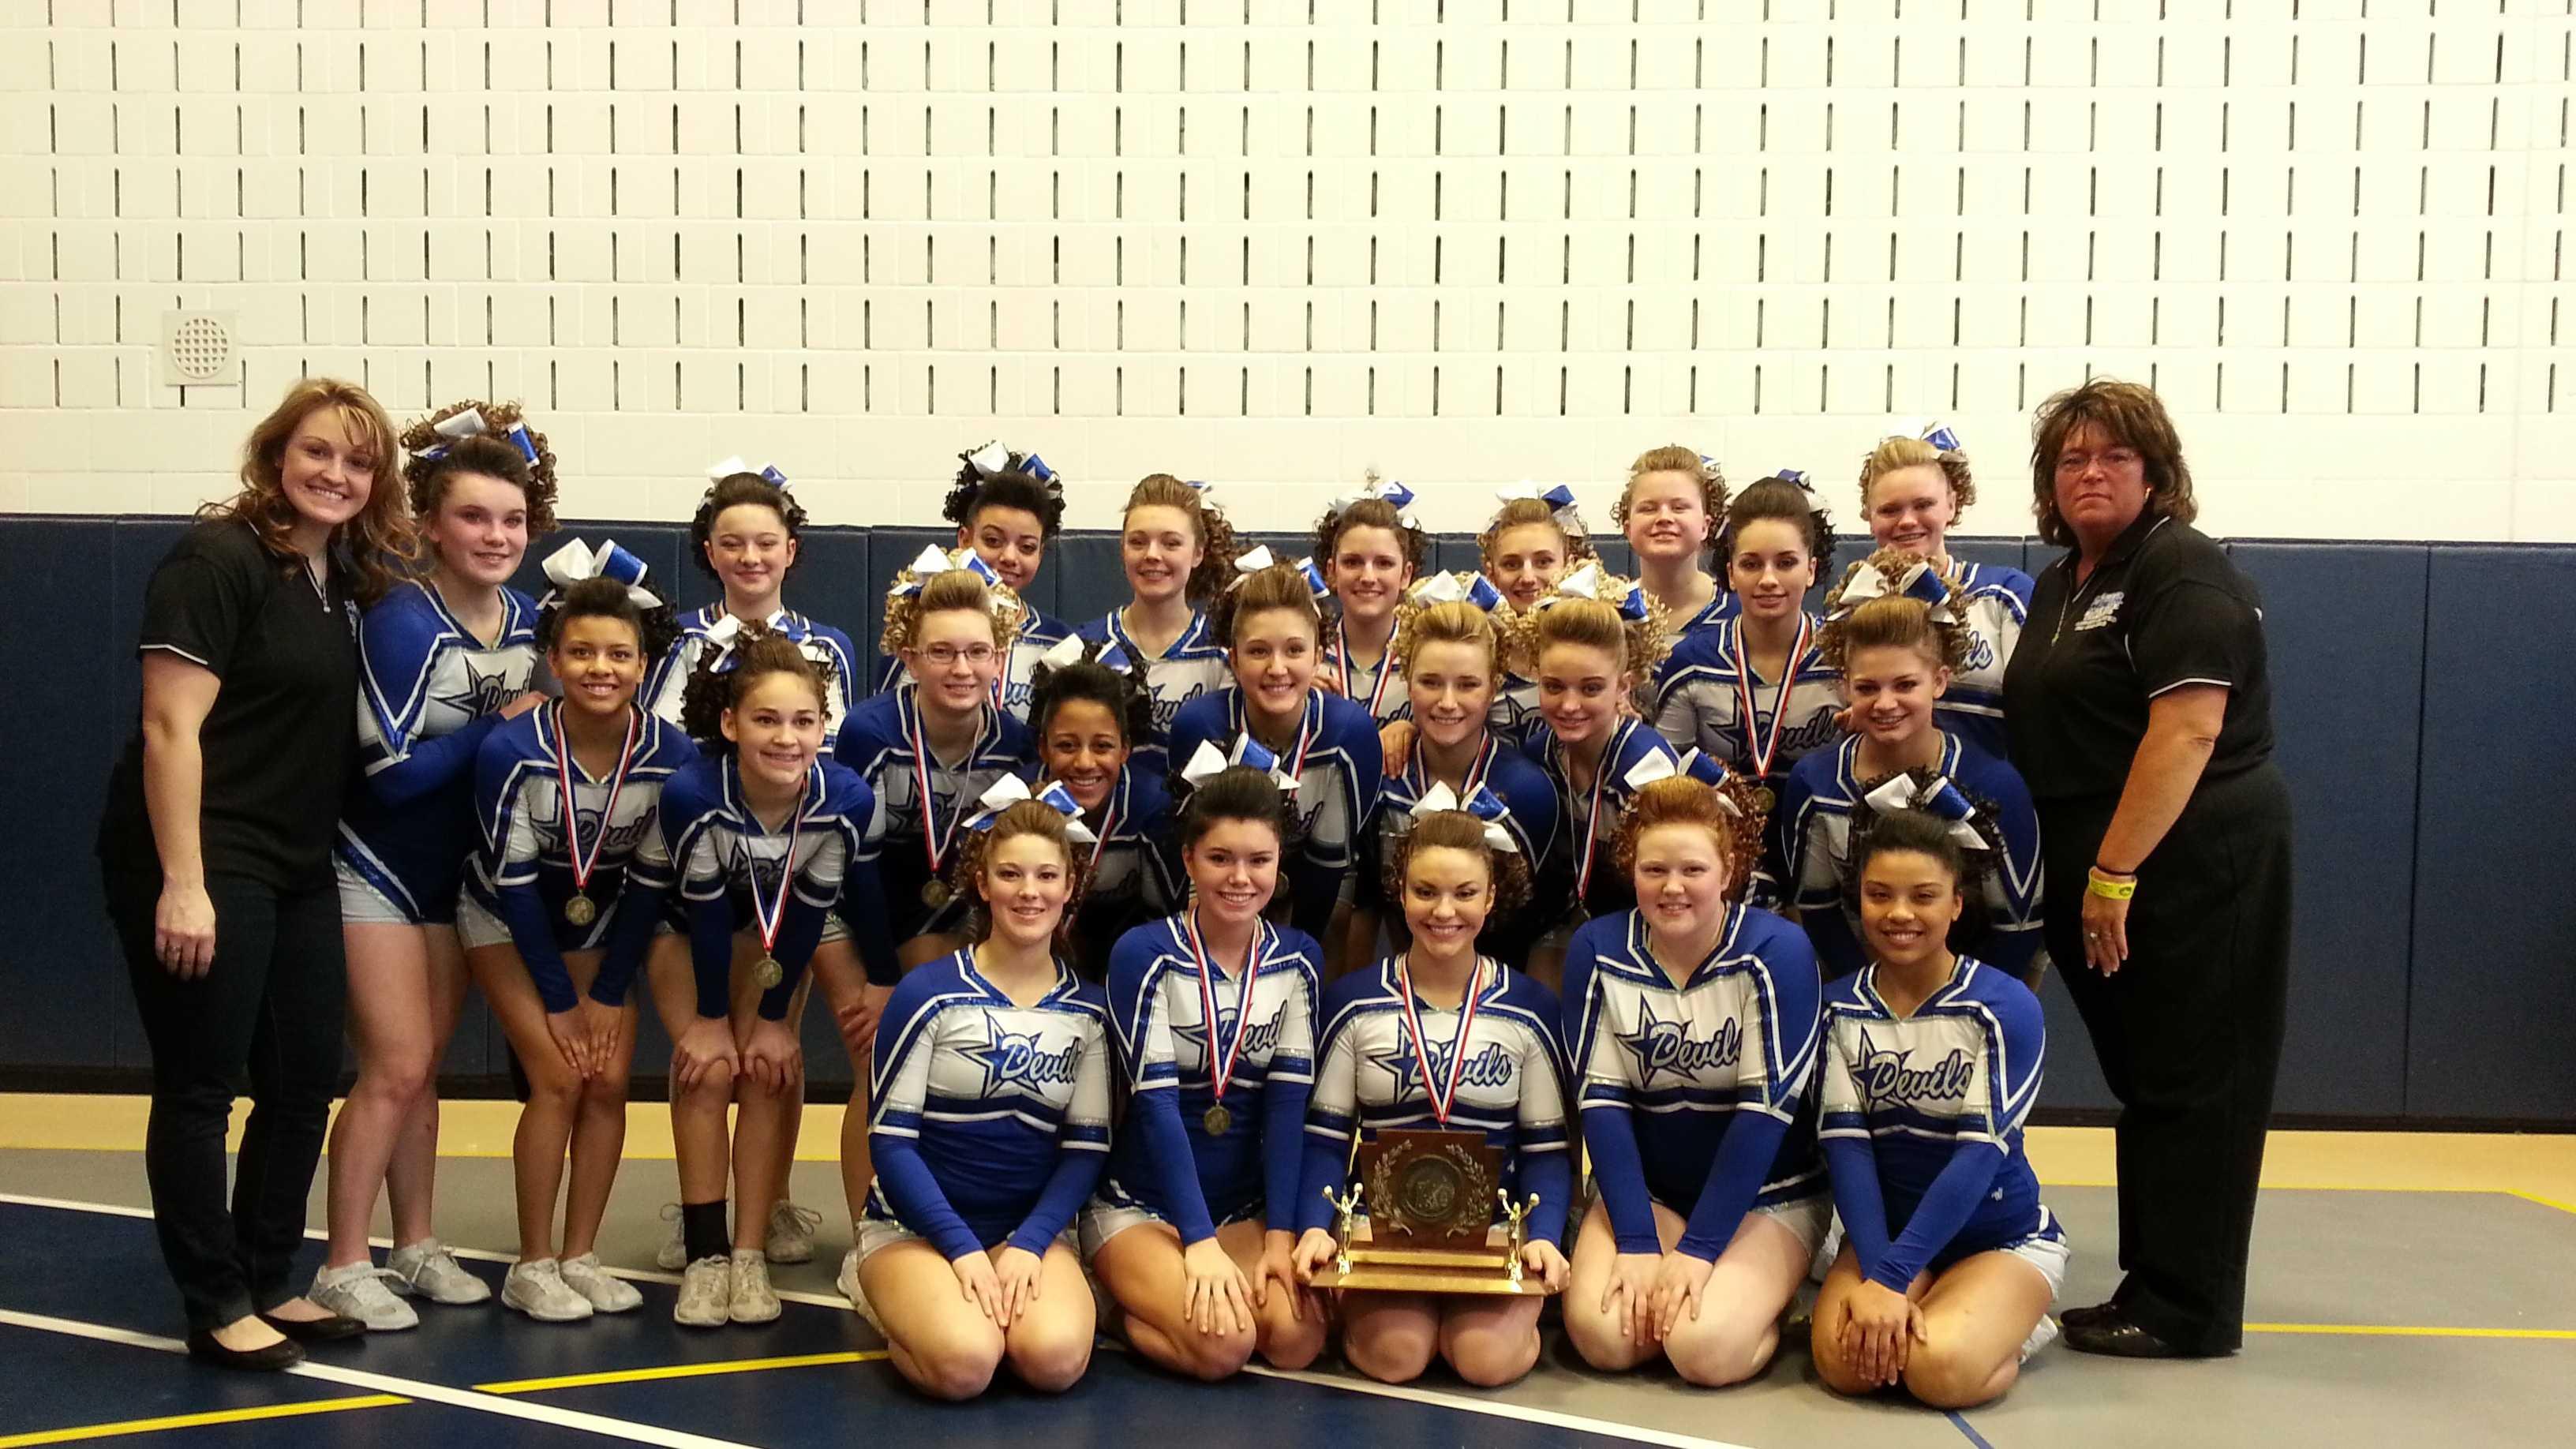 Lewiston High School cheerleaders